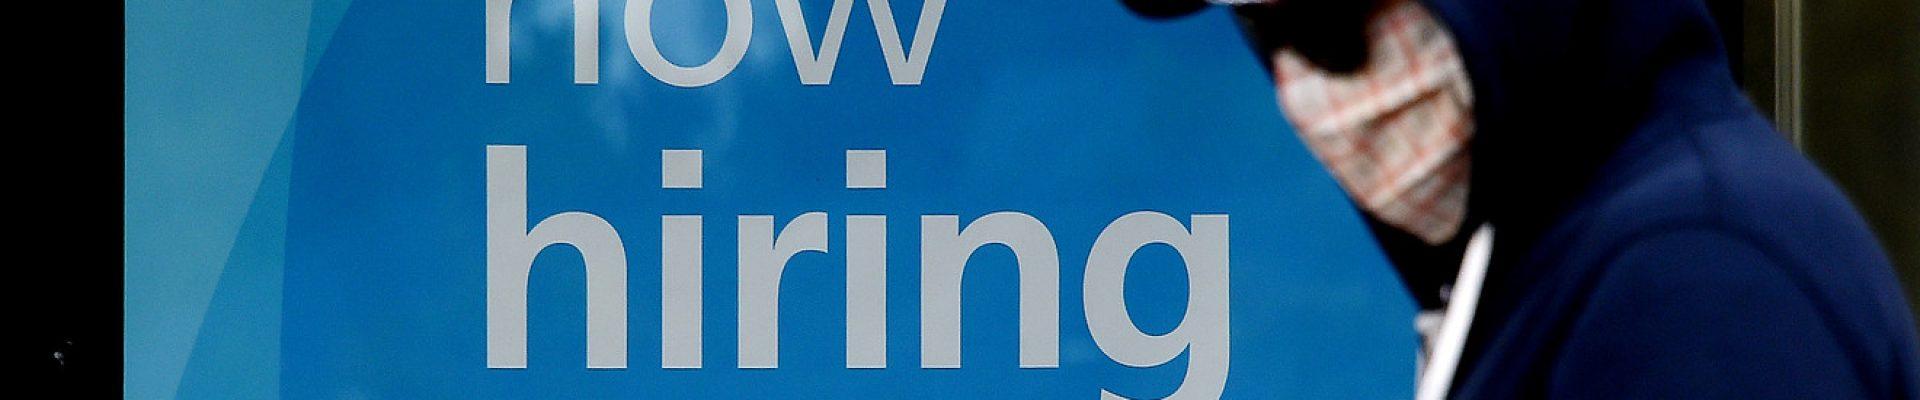 MW-IJ216_hiring_ZG_20200624112252.jpg